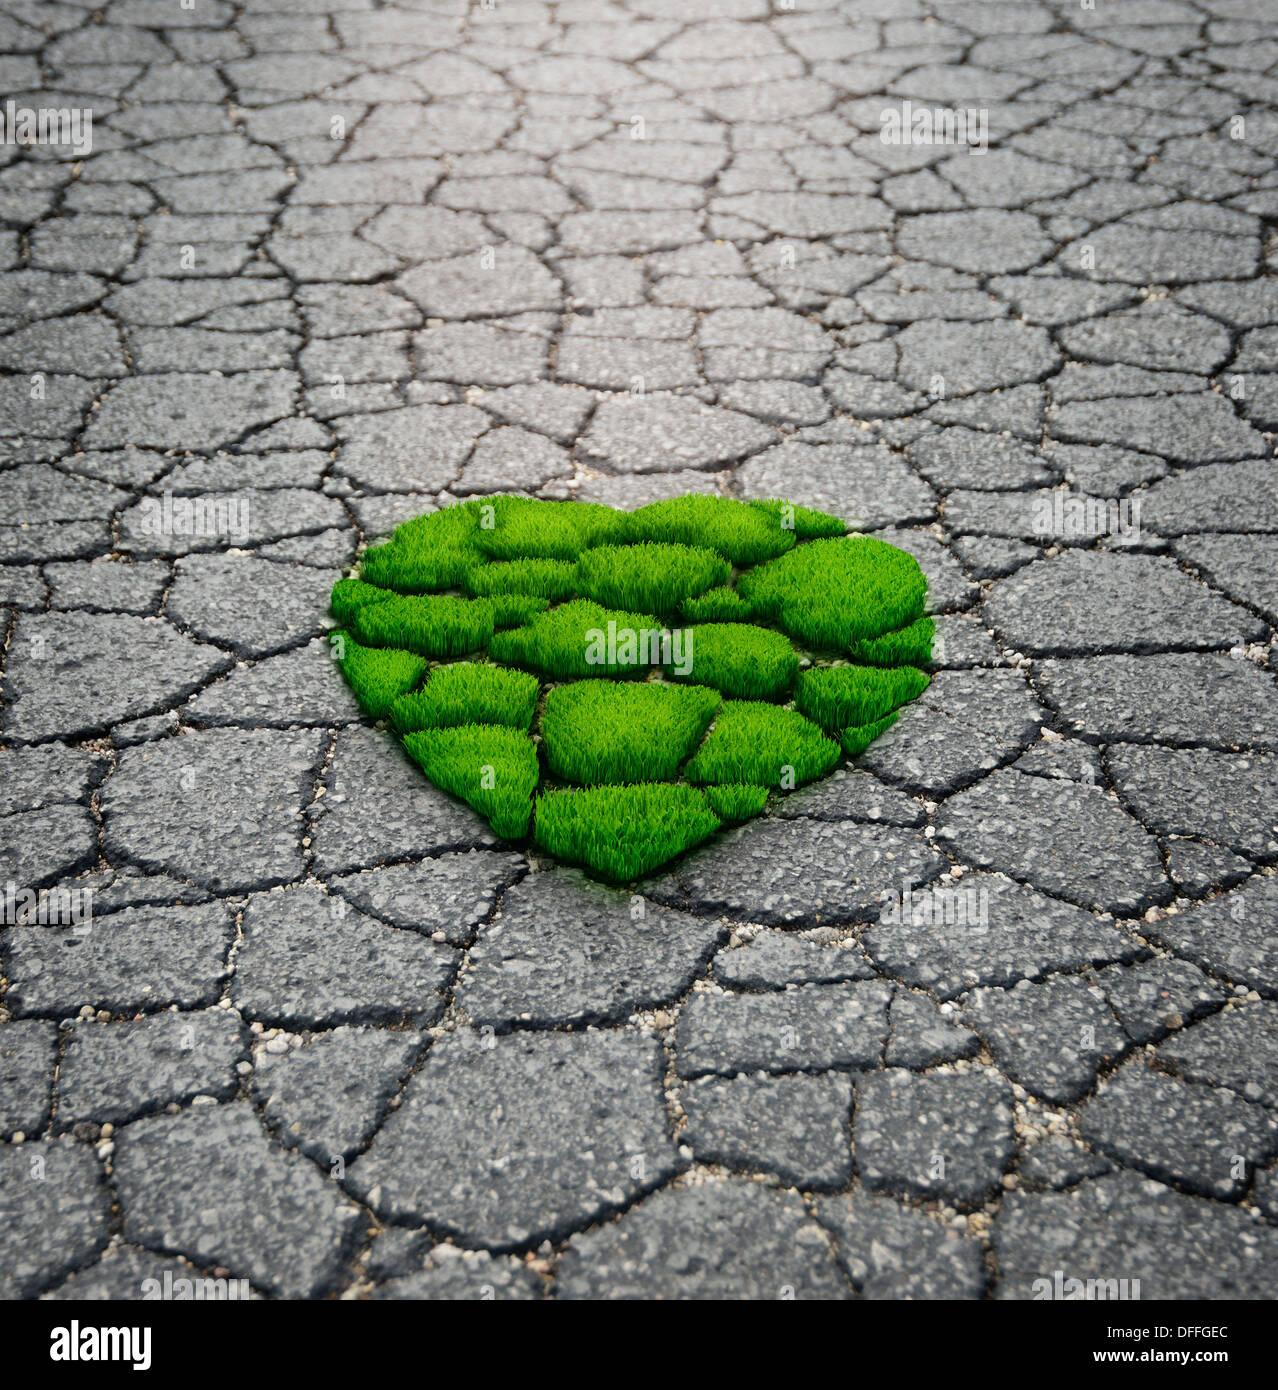 Herz Form Grass wachsen aus dem Asphalt Stockbild